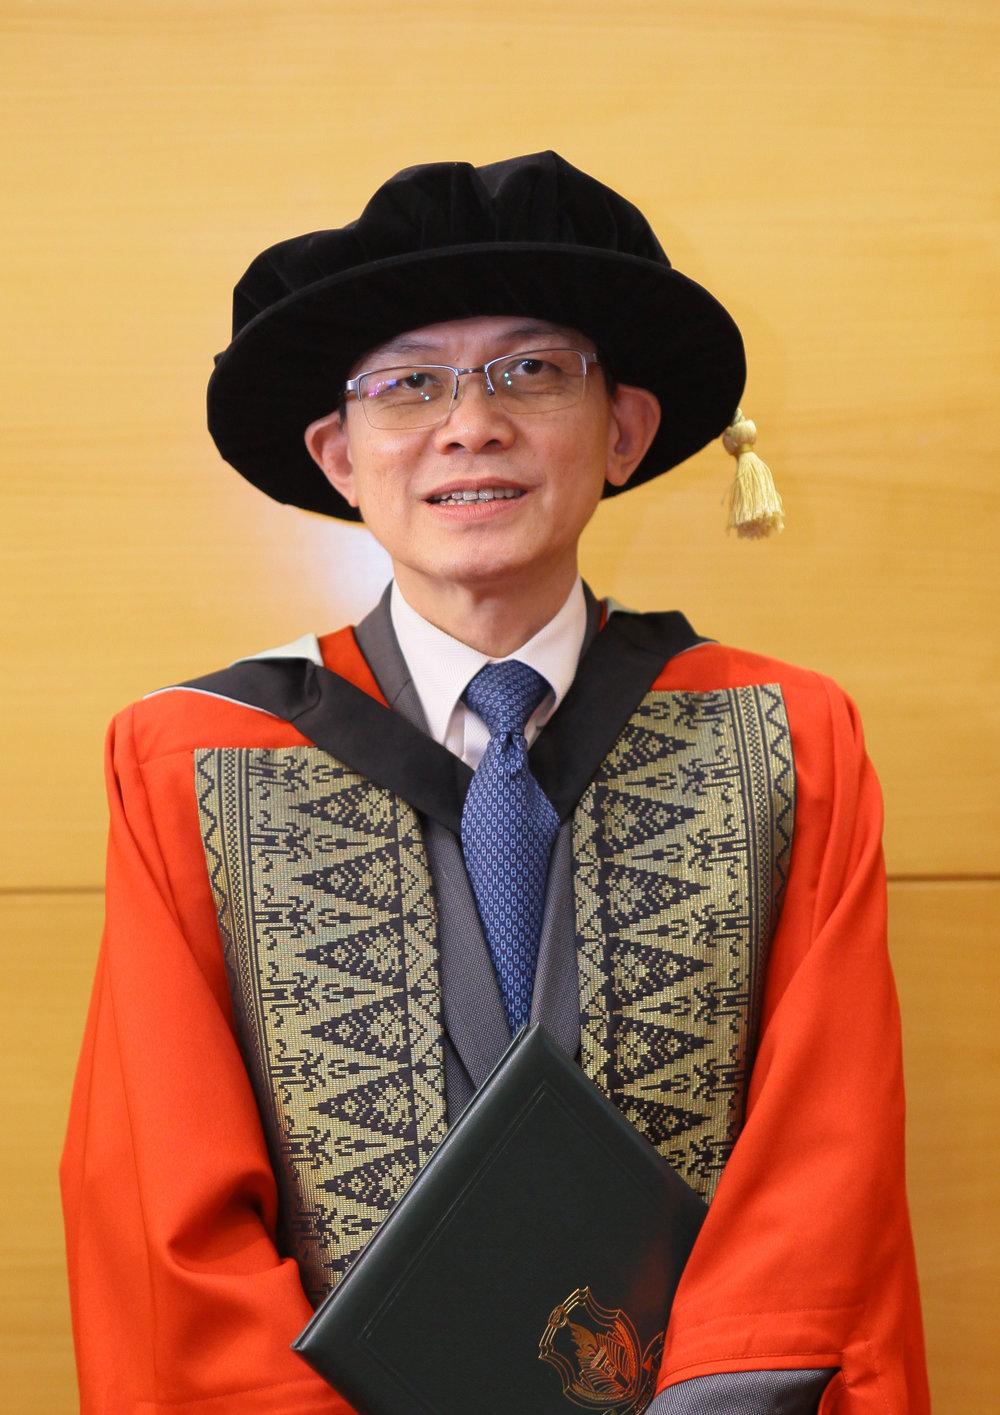 DATO' GOOI HOE SOON - DOCTOR OF BUSINESS